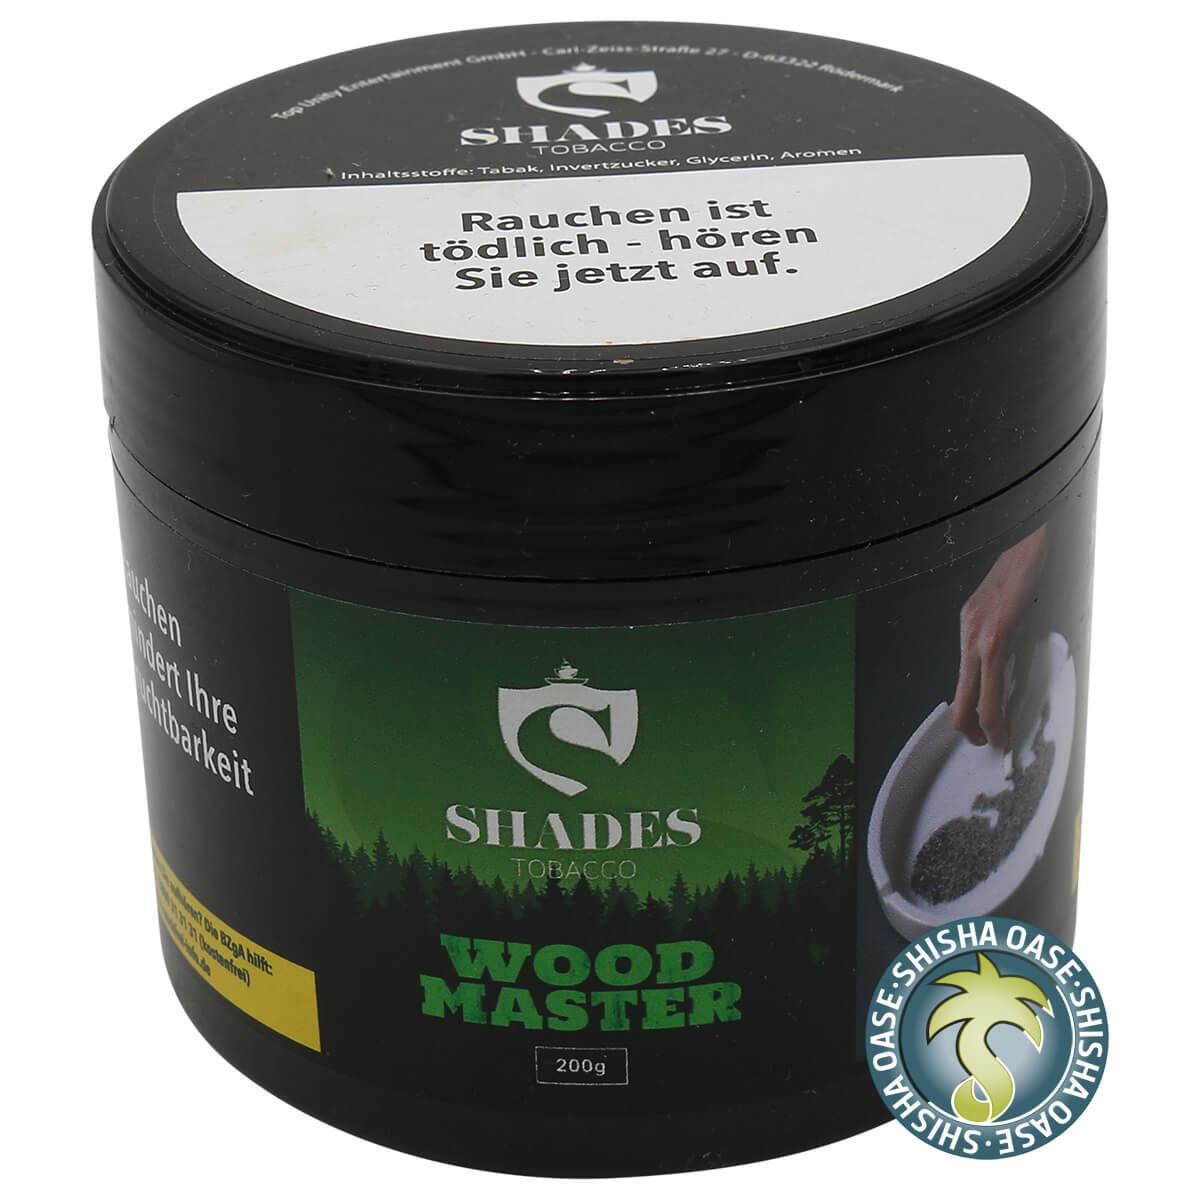 Shades Tabak Wood Master 200g